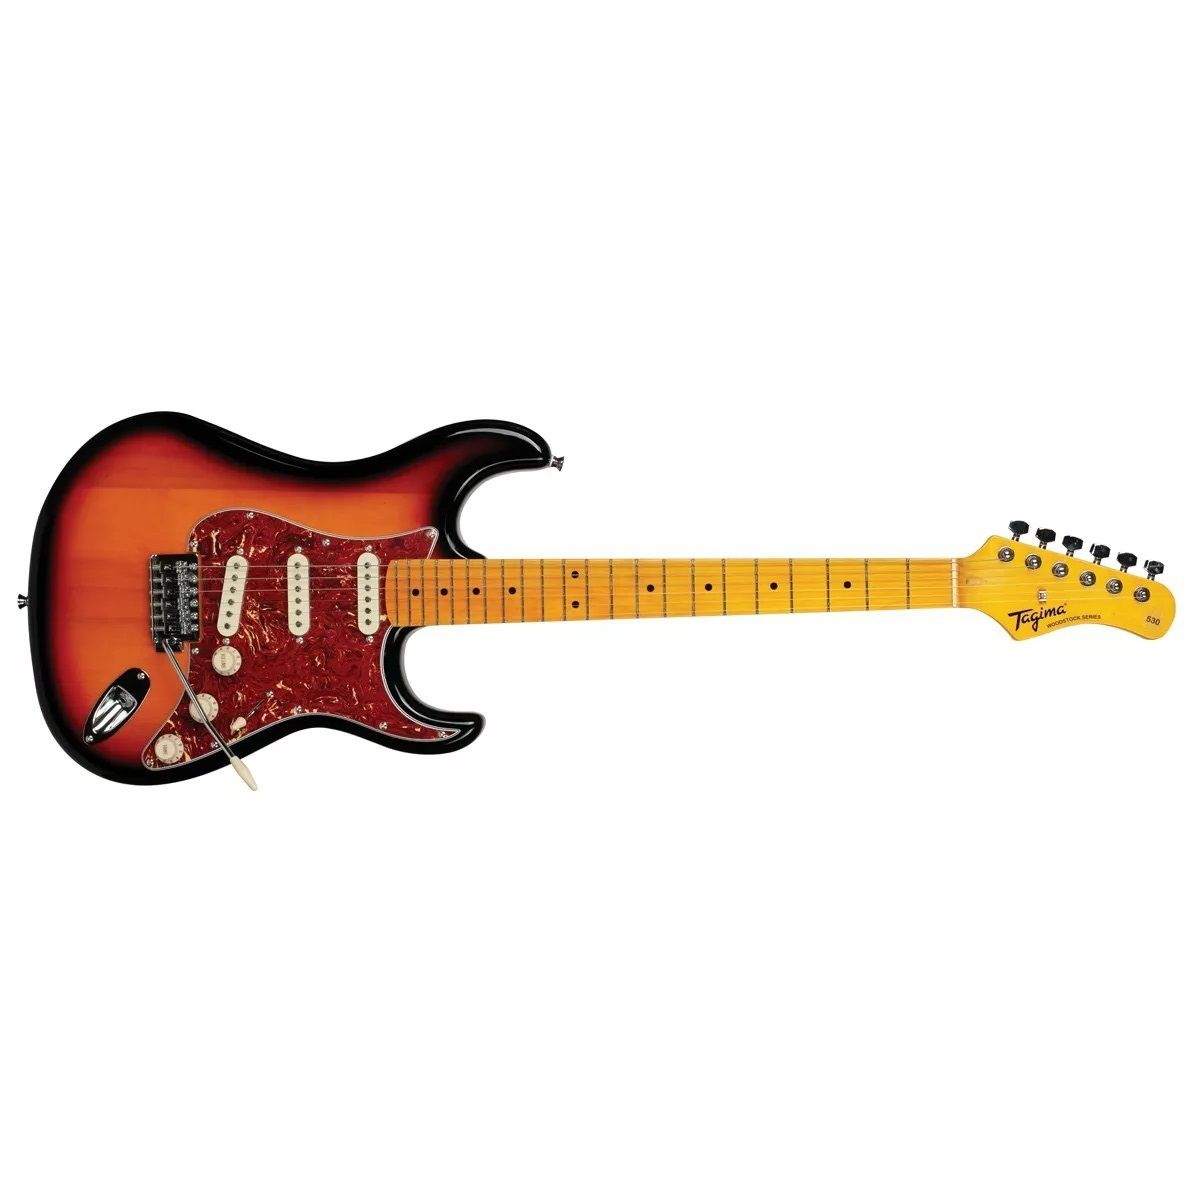 Guitarra Tagima Stratocaster Woodstock Tg530 Sb Sunburst